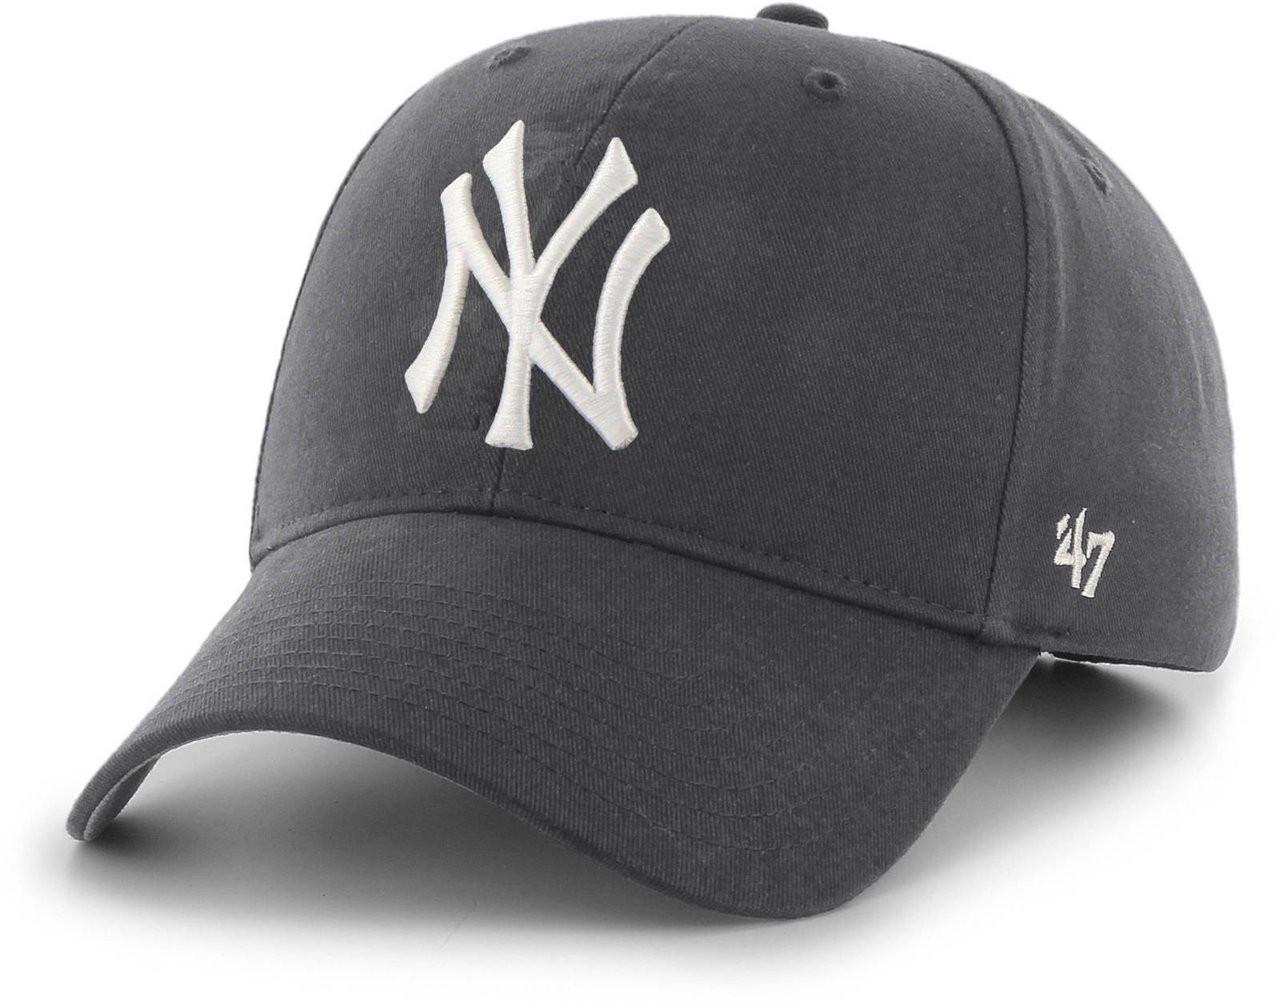 NY Yankees Original Gray MVP Adjustable Cap  photo